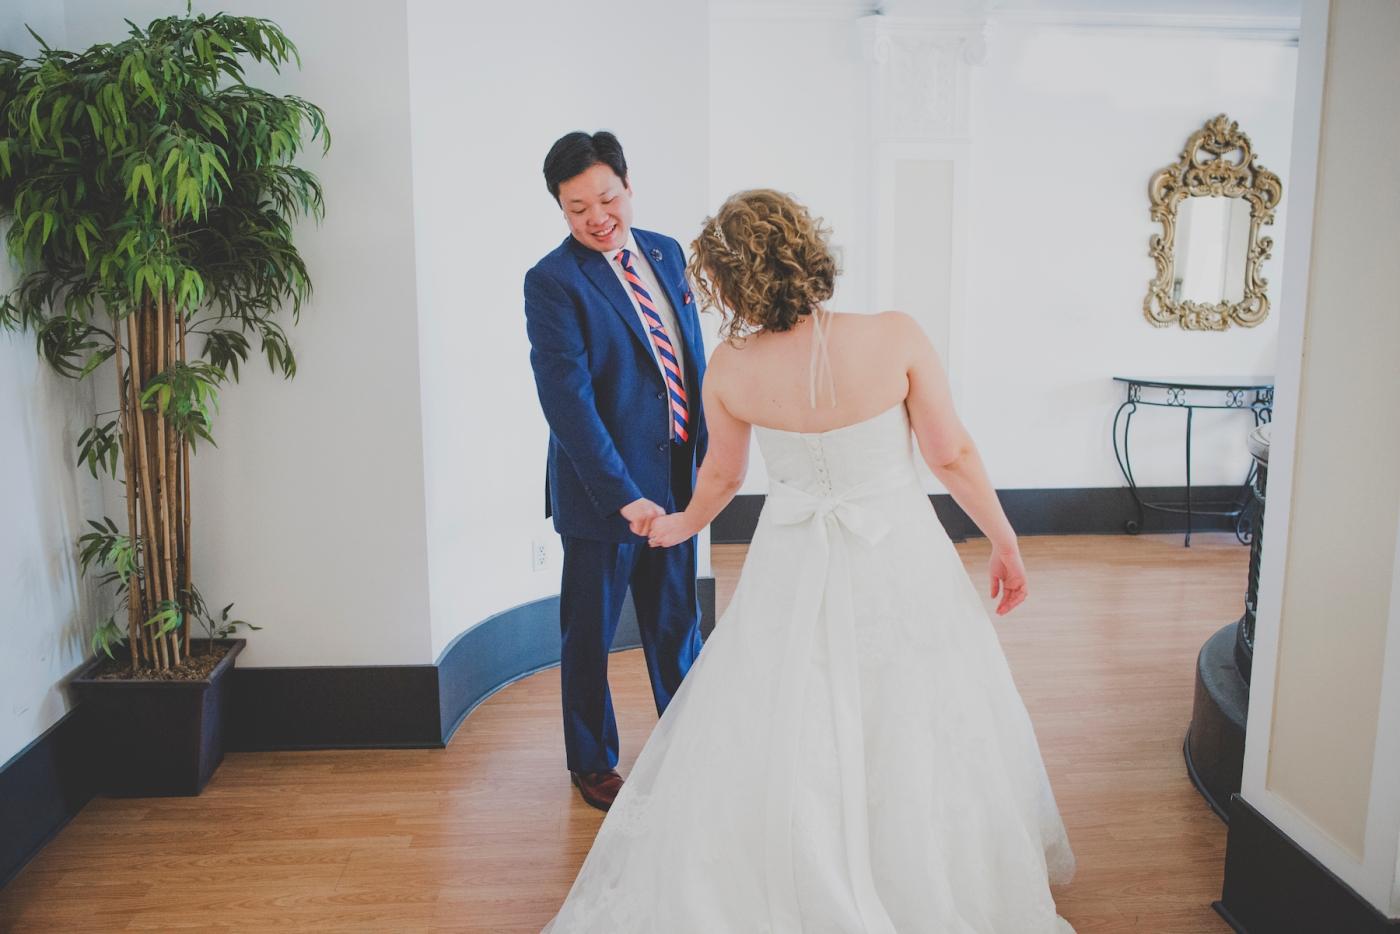 DSC_2058Everett_Wedding_Ballroom_Jane_Speleers_photography_Rachel_and_Edmund_First_look_2017